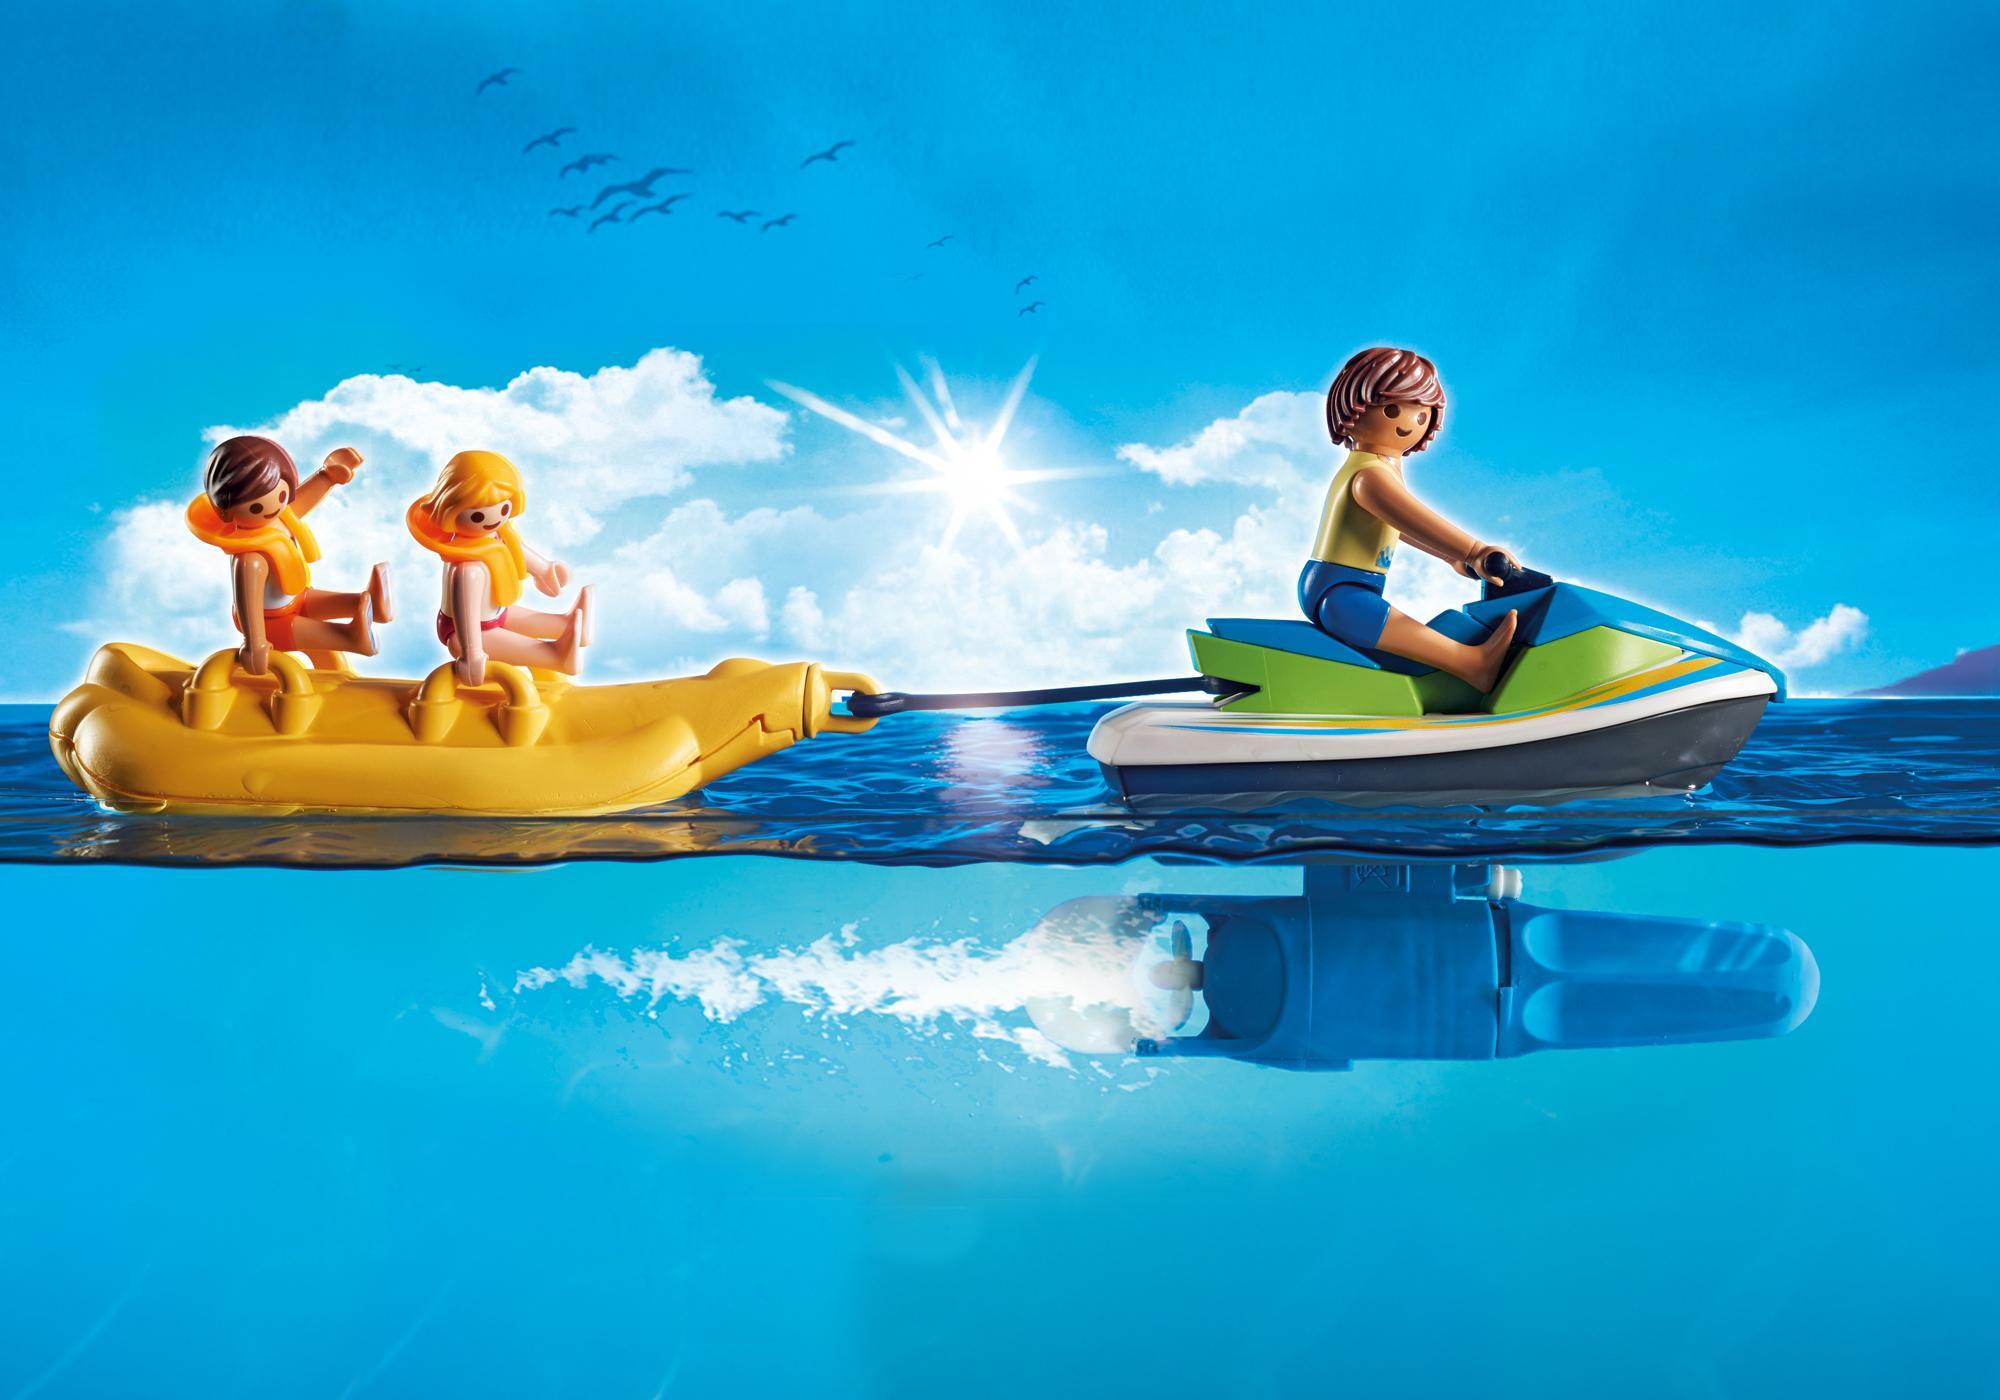 http://media.playmobil.com/i/playmobil/6980_product_extra2/Personal Watercraft with Banana Boat